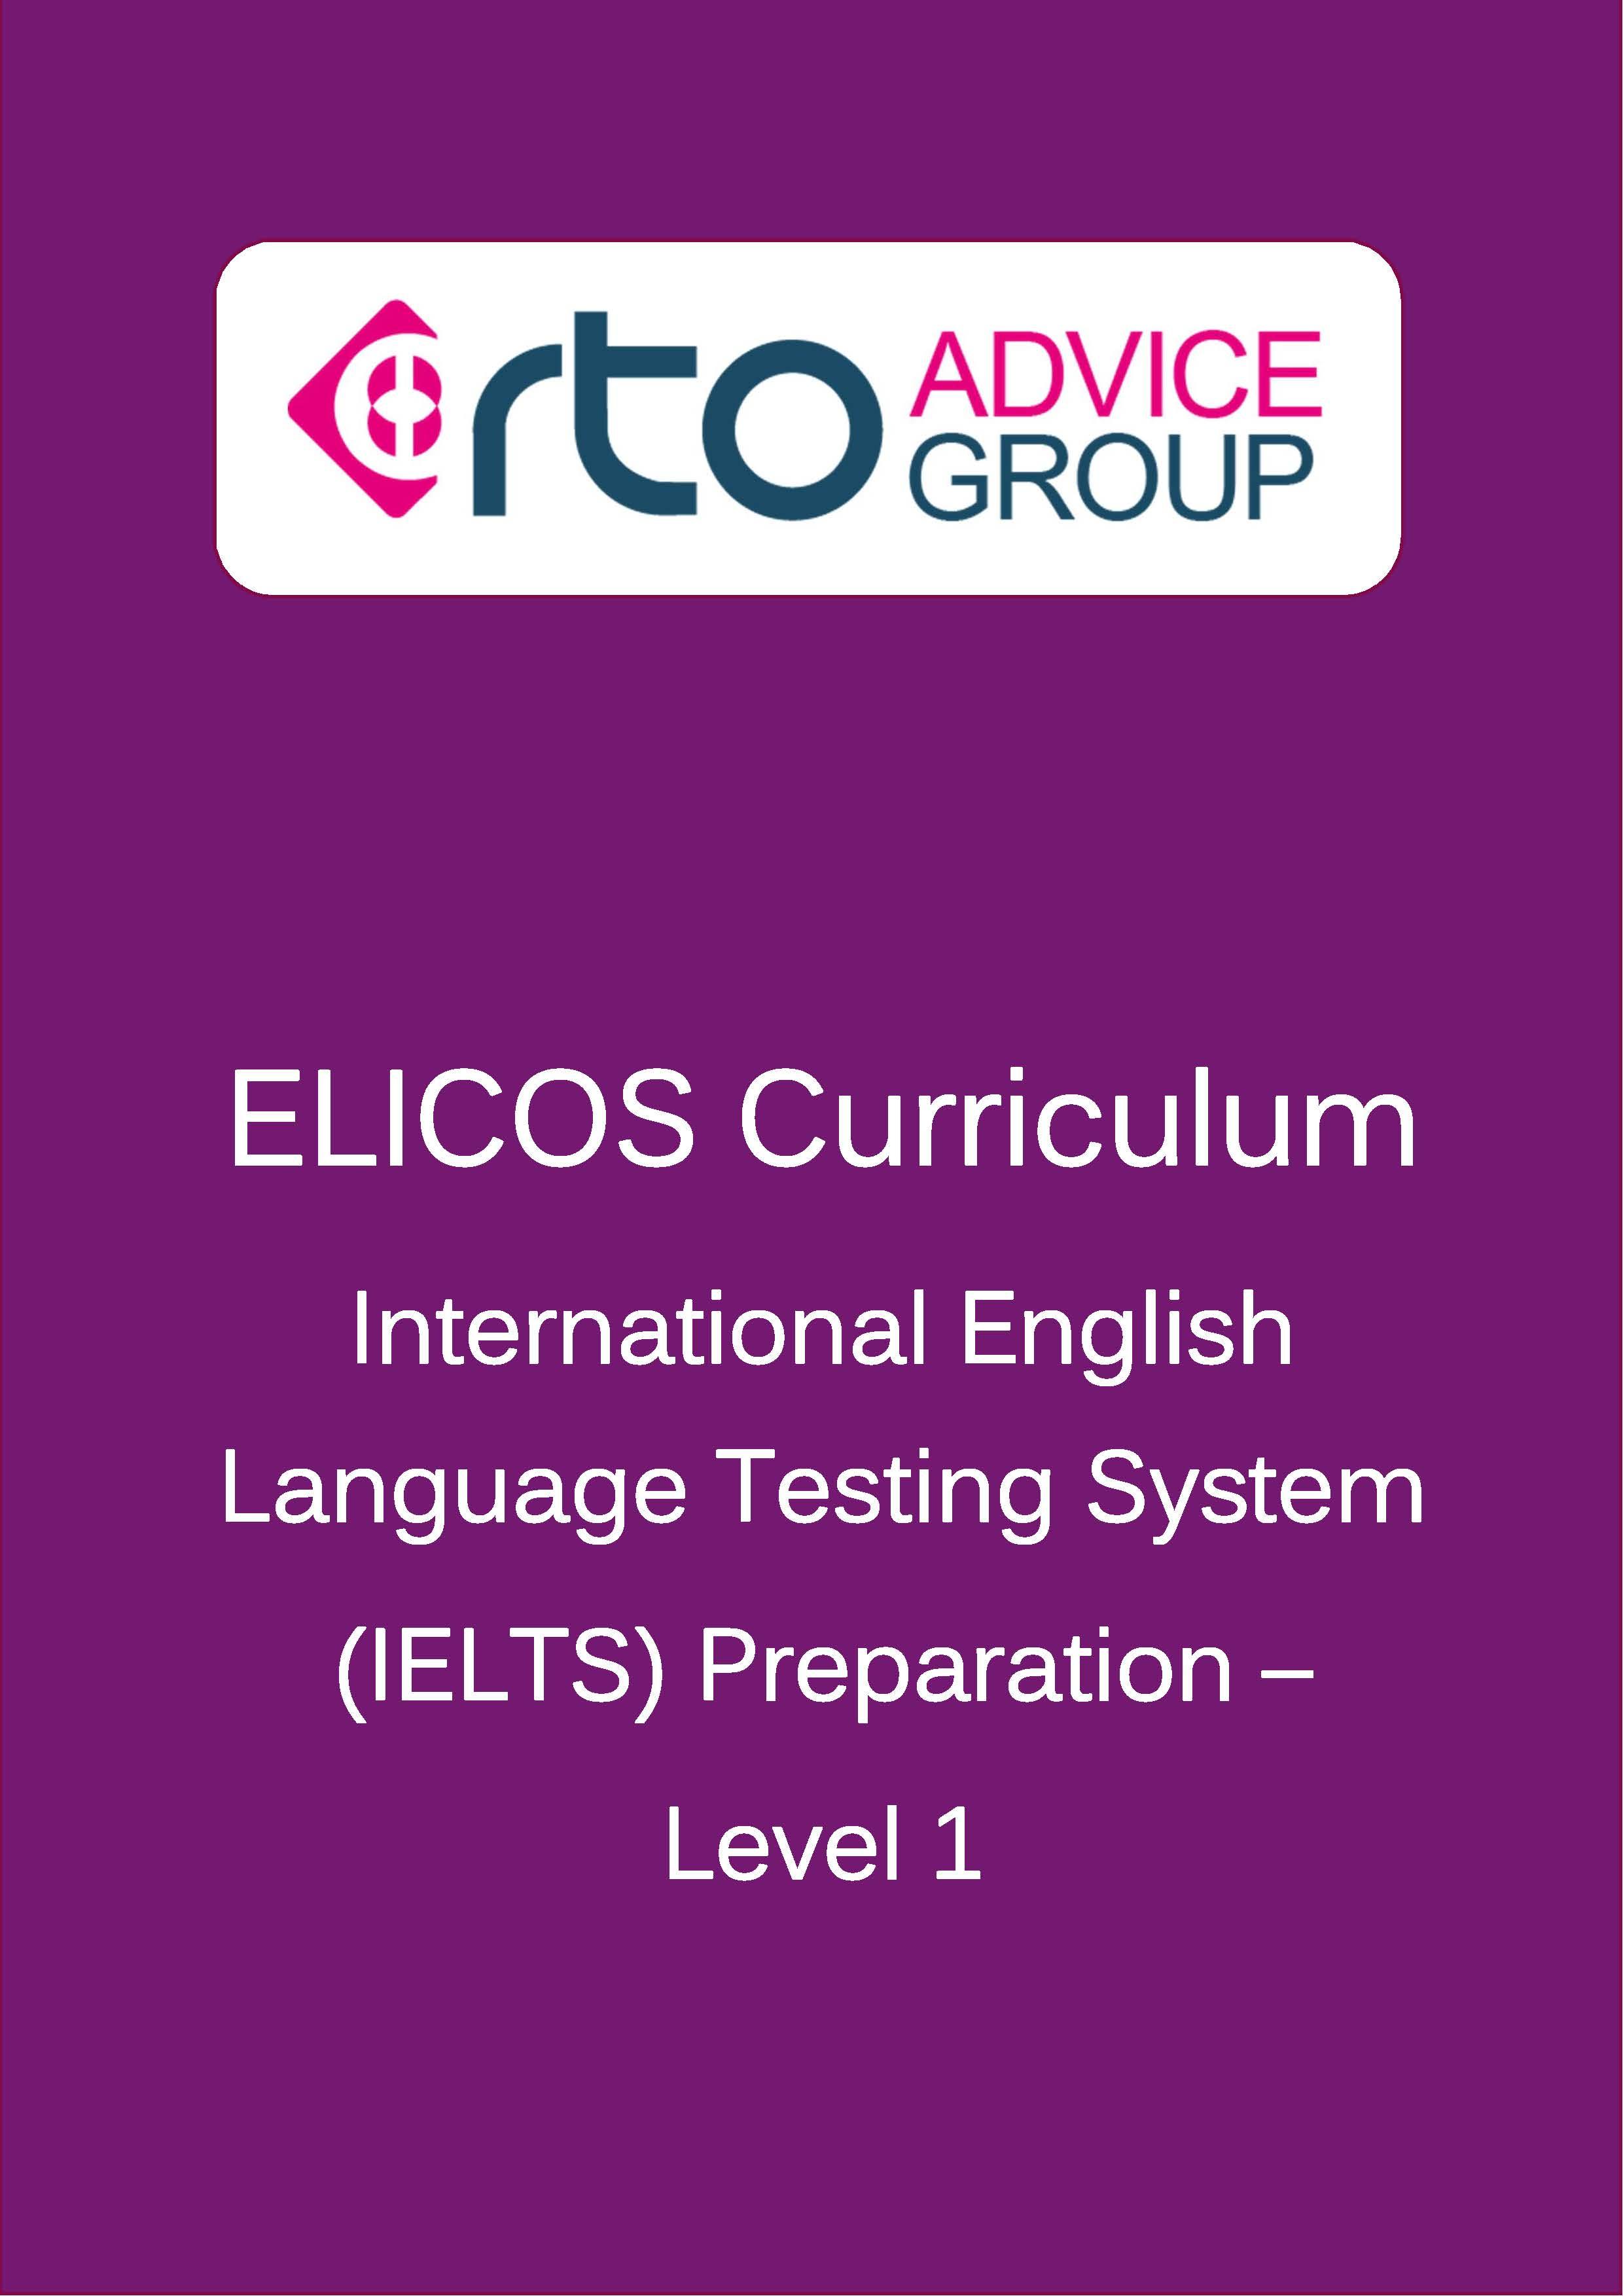 ELICOS Curriculum – International English Language Testing System Preparation Level 1